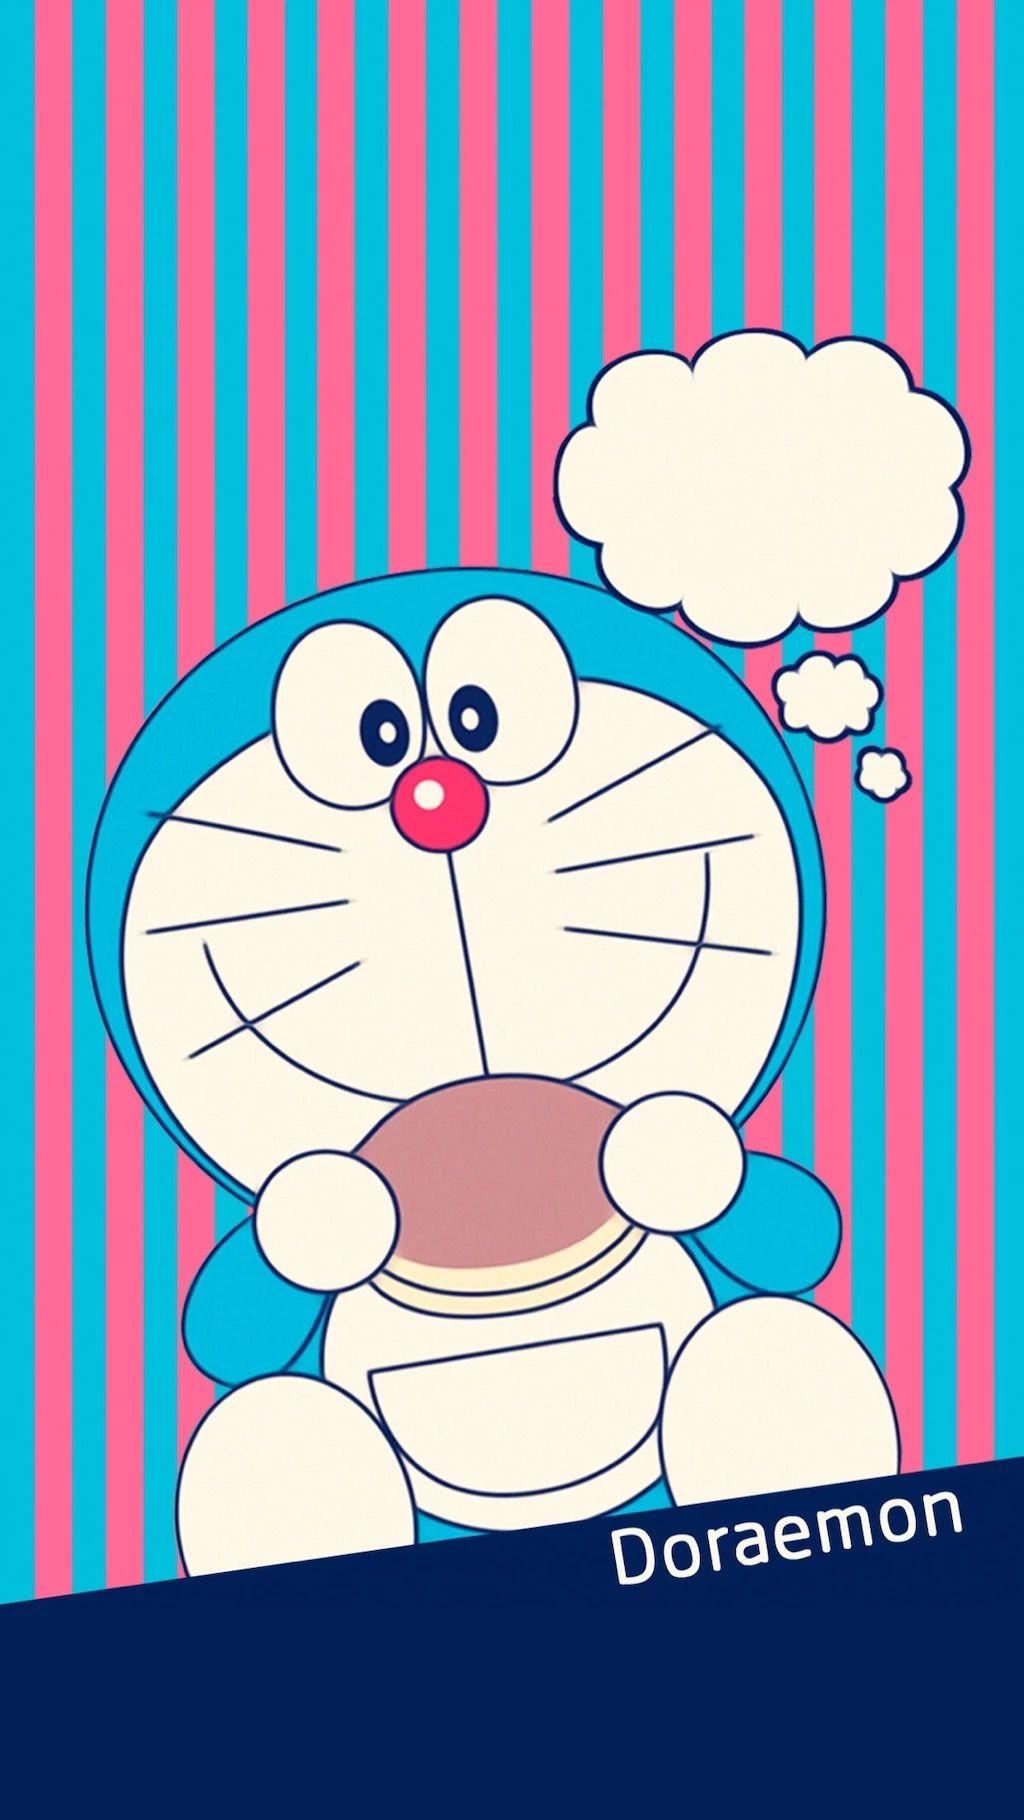 Doraemon Fondos De Pantalla Tablet 10 Choice Image Wallpaper And Free Download